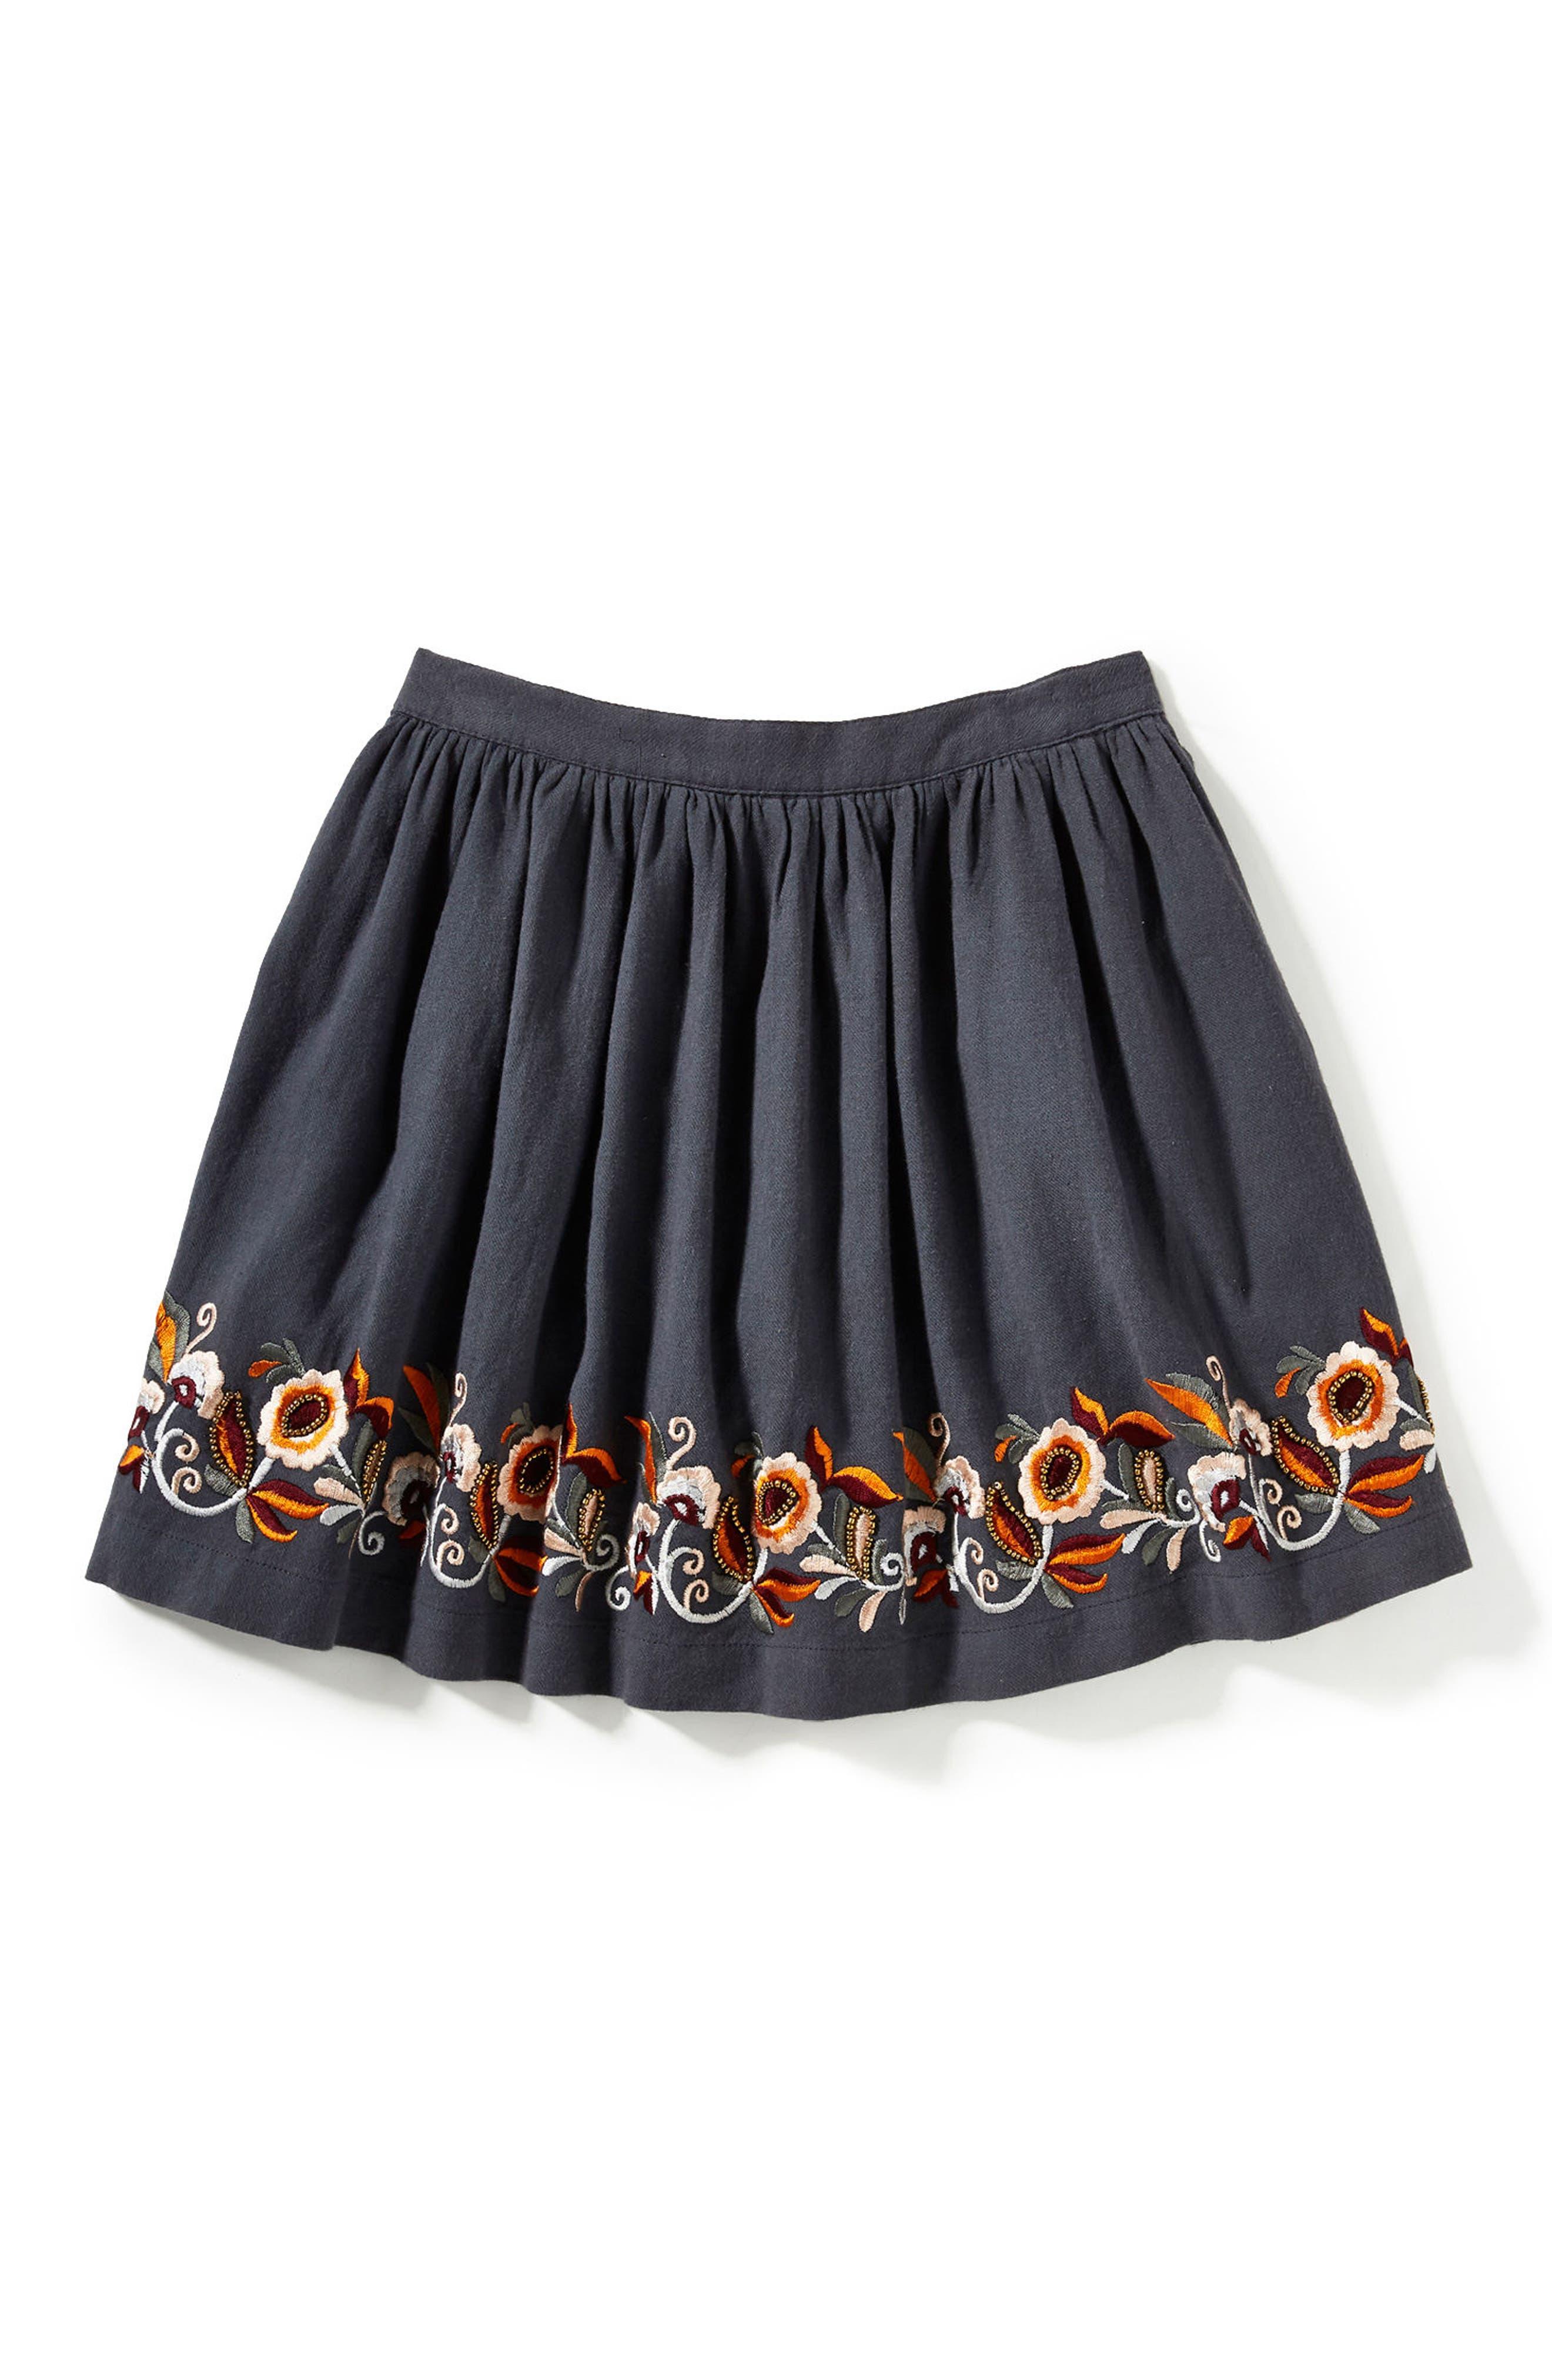 Main Image - Peek Claire Embroidered Skirt (Toddler Girls, Little Girls & Big Girls)